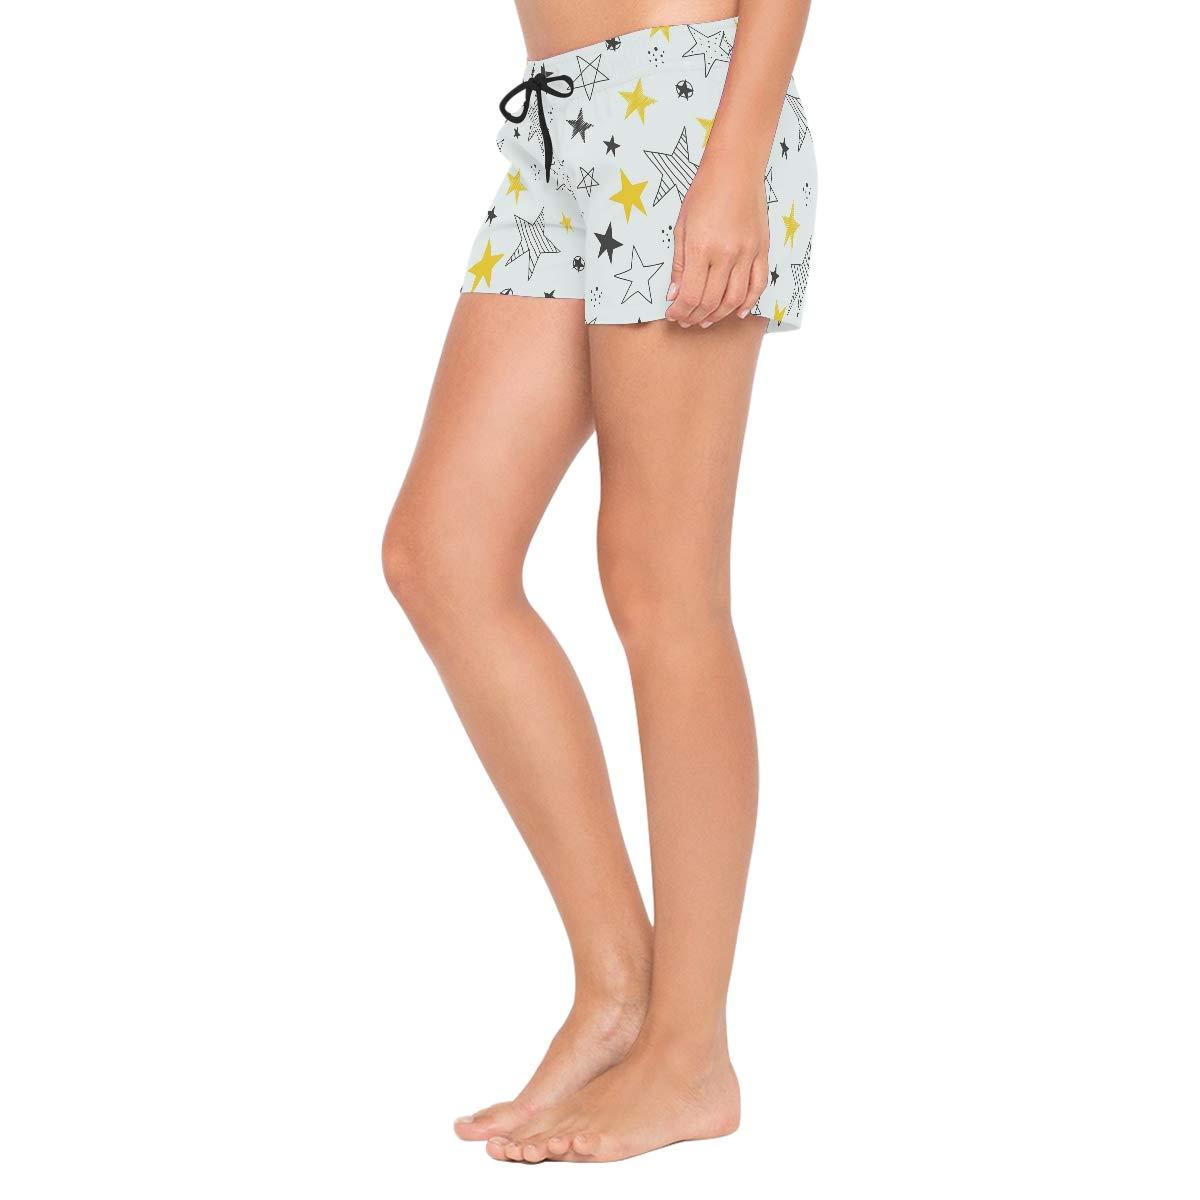 Women Swim Trunks Hand Drawn Stars Pattern Yellow Black Beach Board Shorts